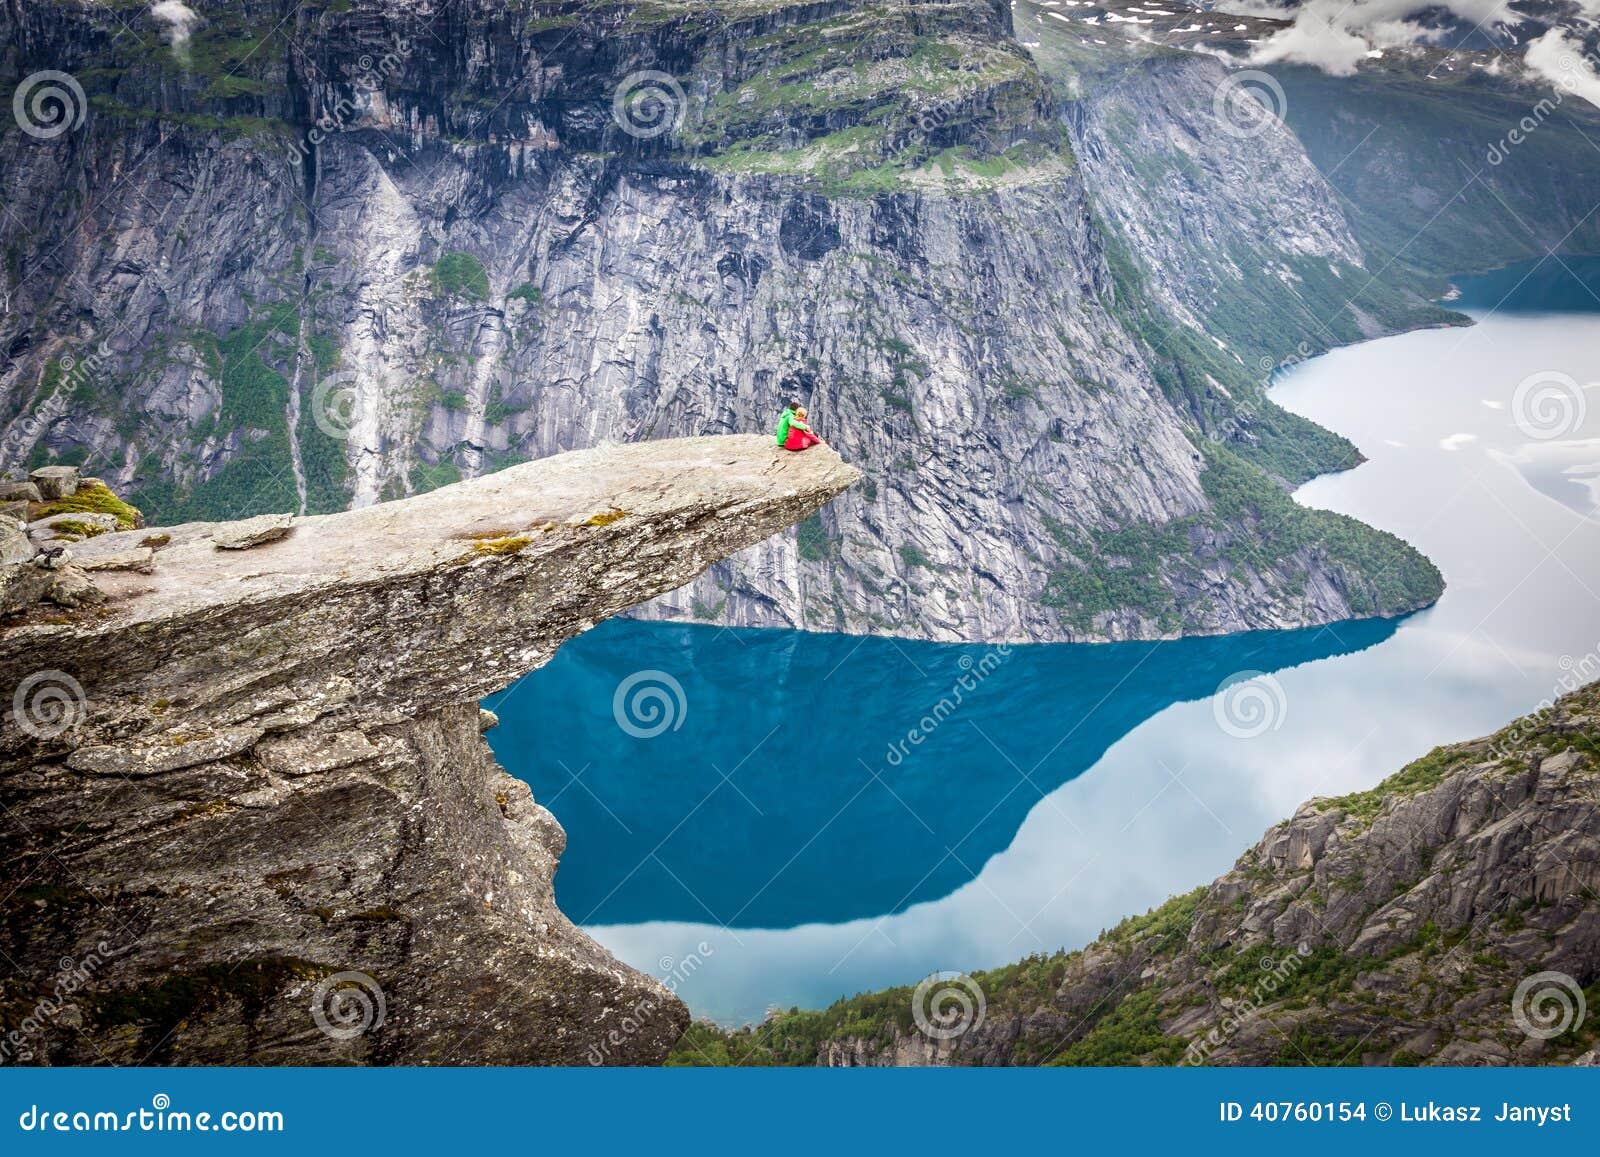 Norway Mountain Trolltunga Odda Fjord Norge Hiking Trail Stock Photo Image 40760154